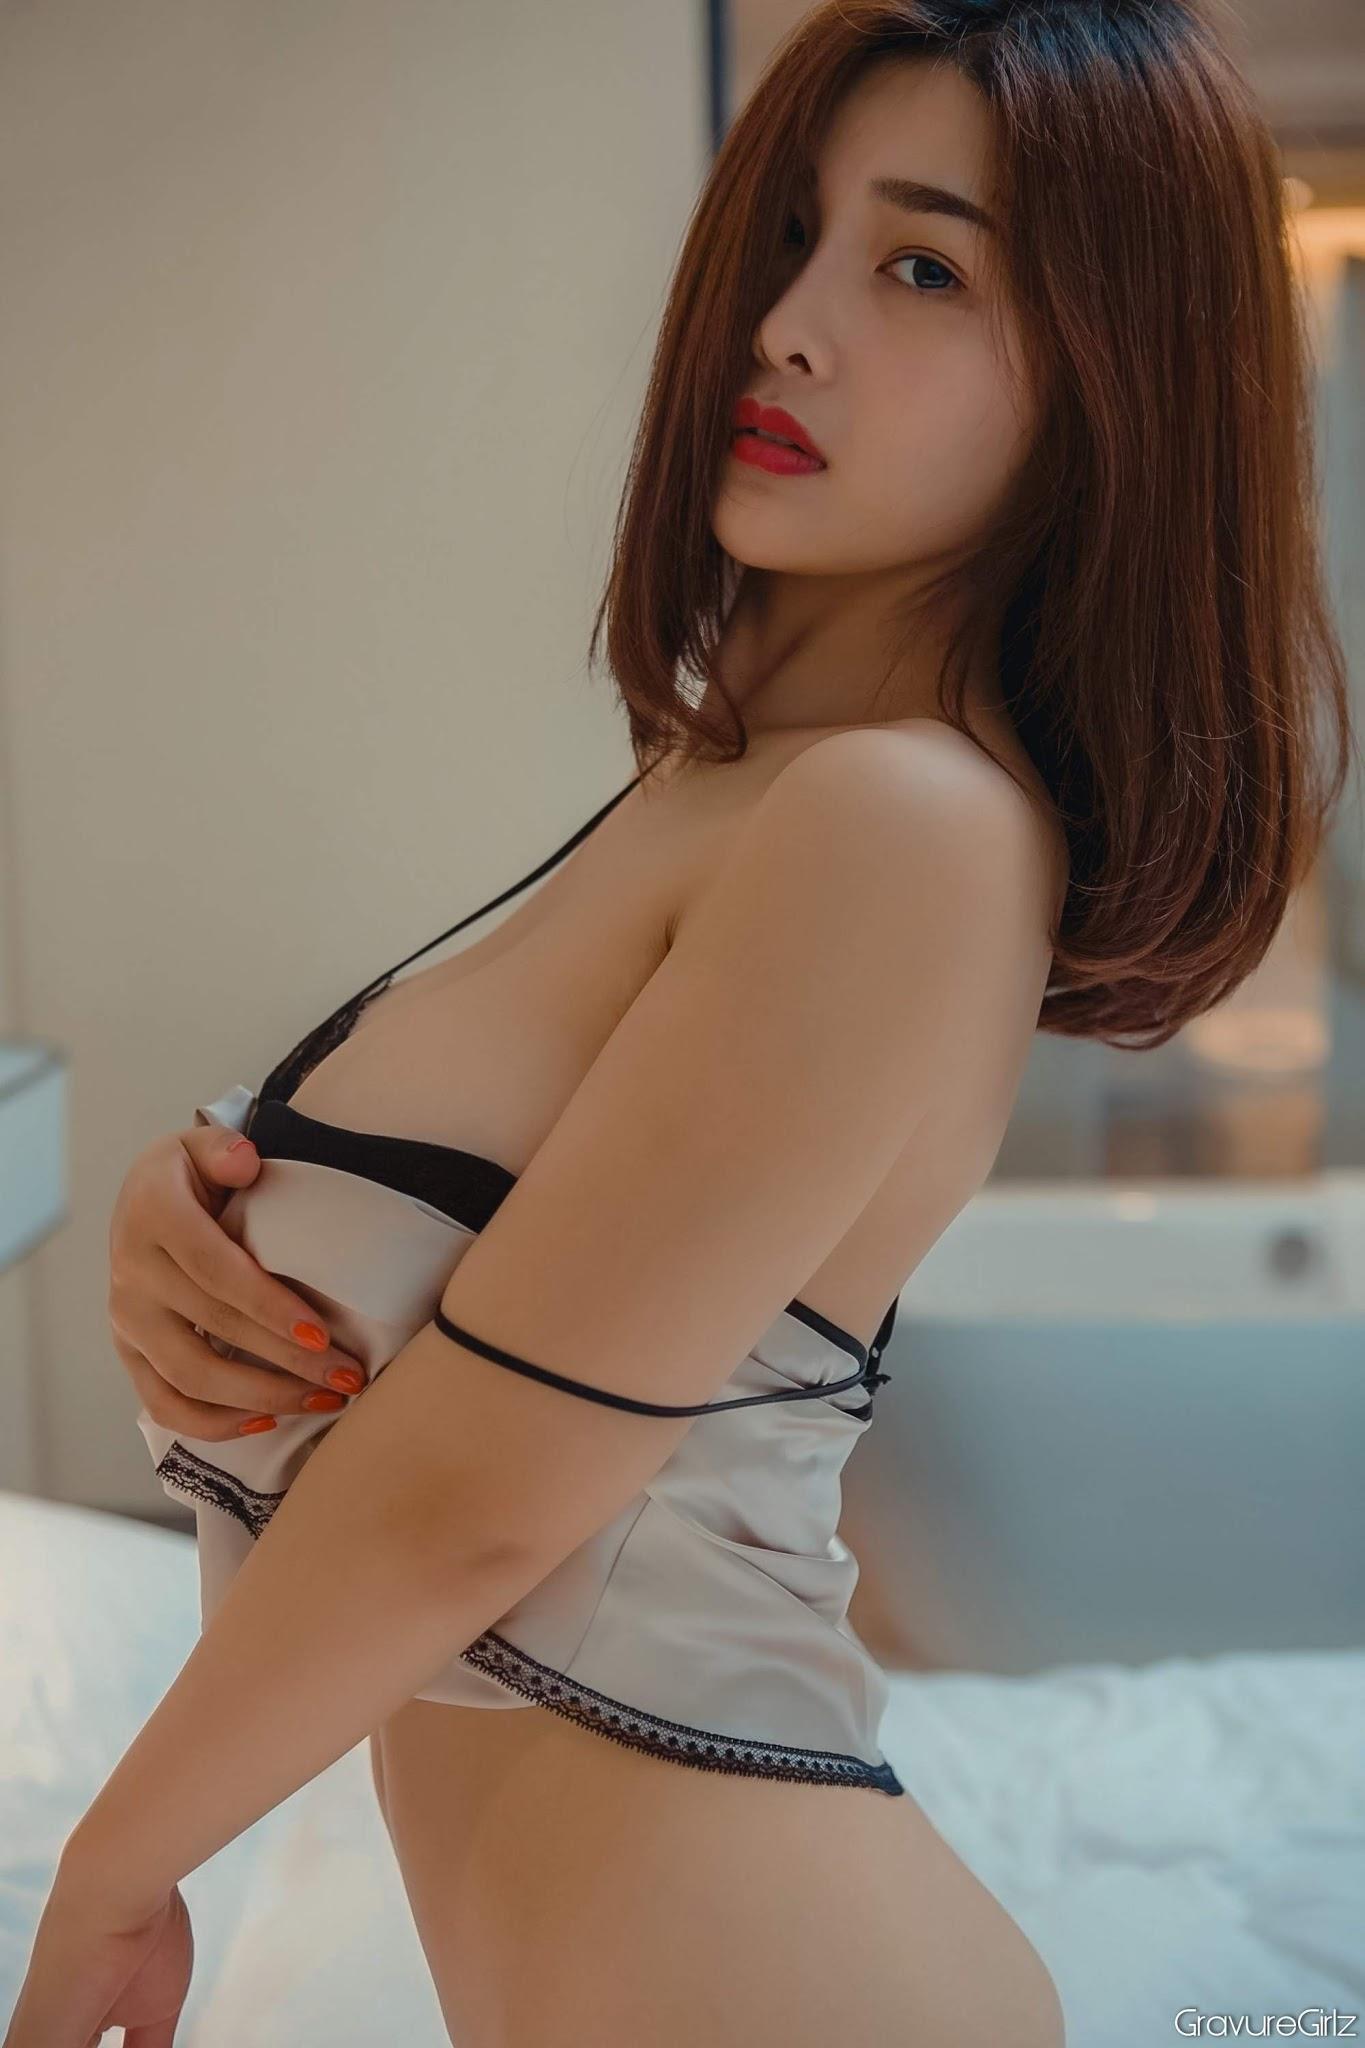 Yan Panpan Sexy Big Breasts Police Cosplay In Tiny - Hot ...